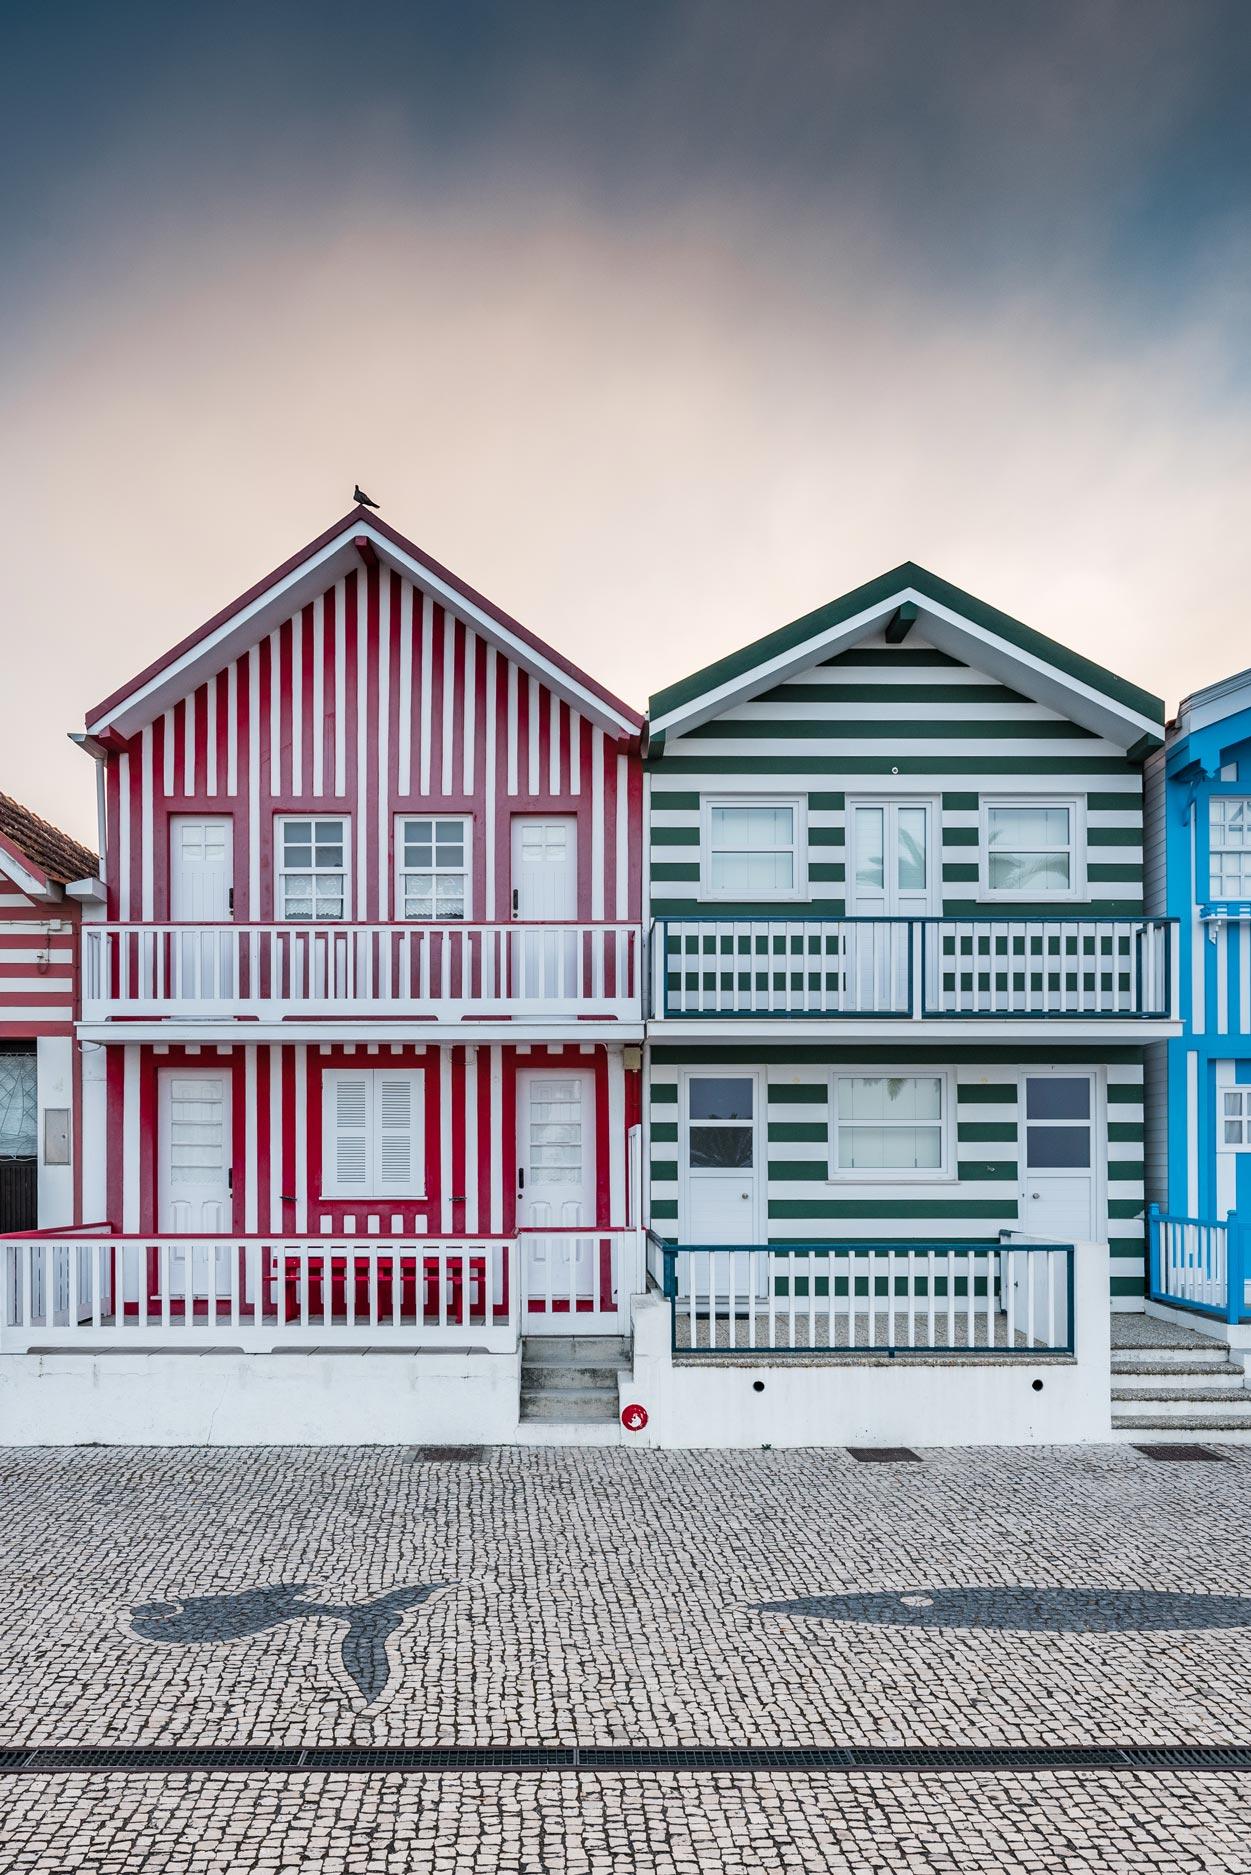 Paesaggi-Portogallo - DSC 2280 - Case a strisce Aveiro - Case a strisce Aveiro